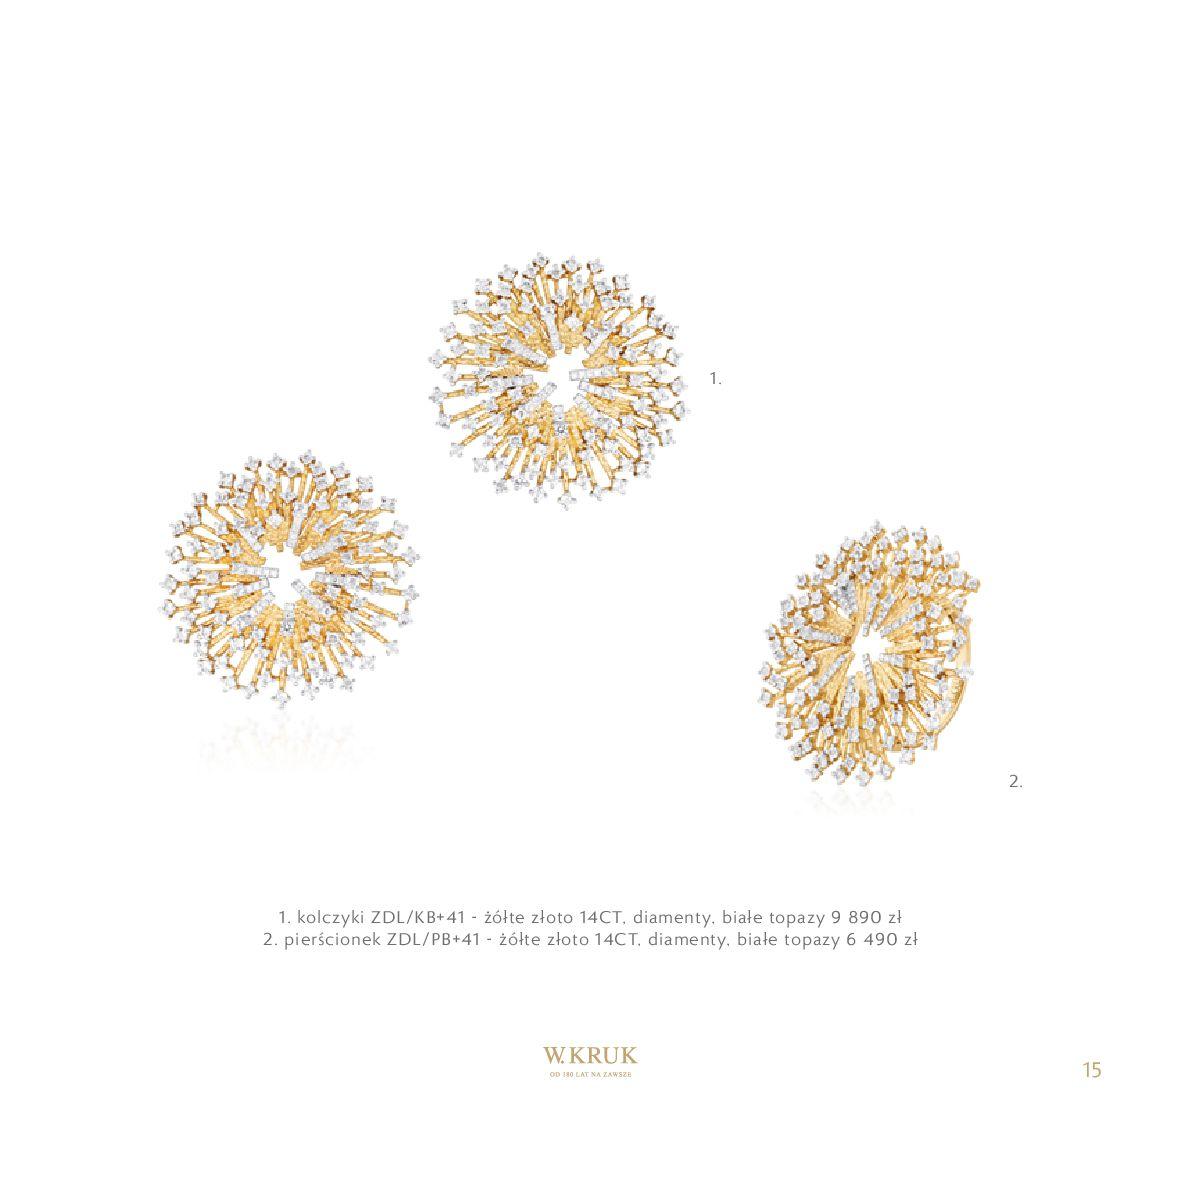 Gazetka W. KRUK: Katalog - Kolekcja Blask 2021-02-17 page-16